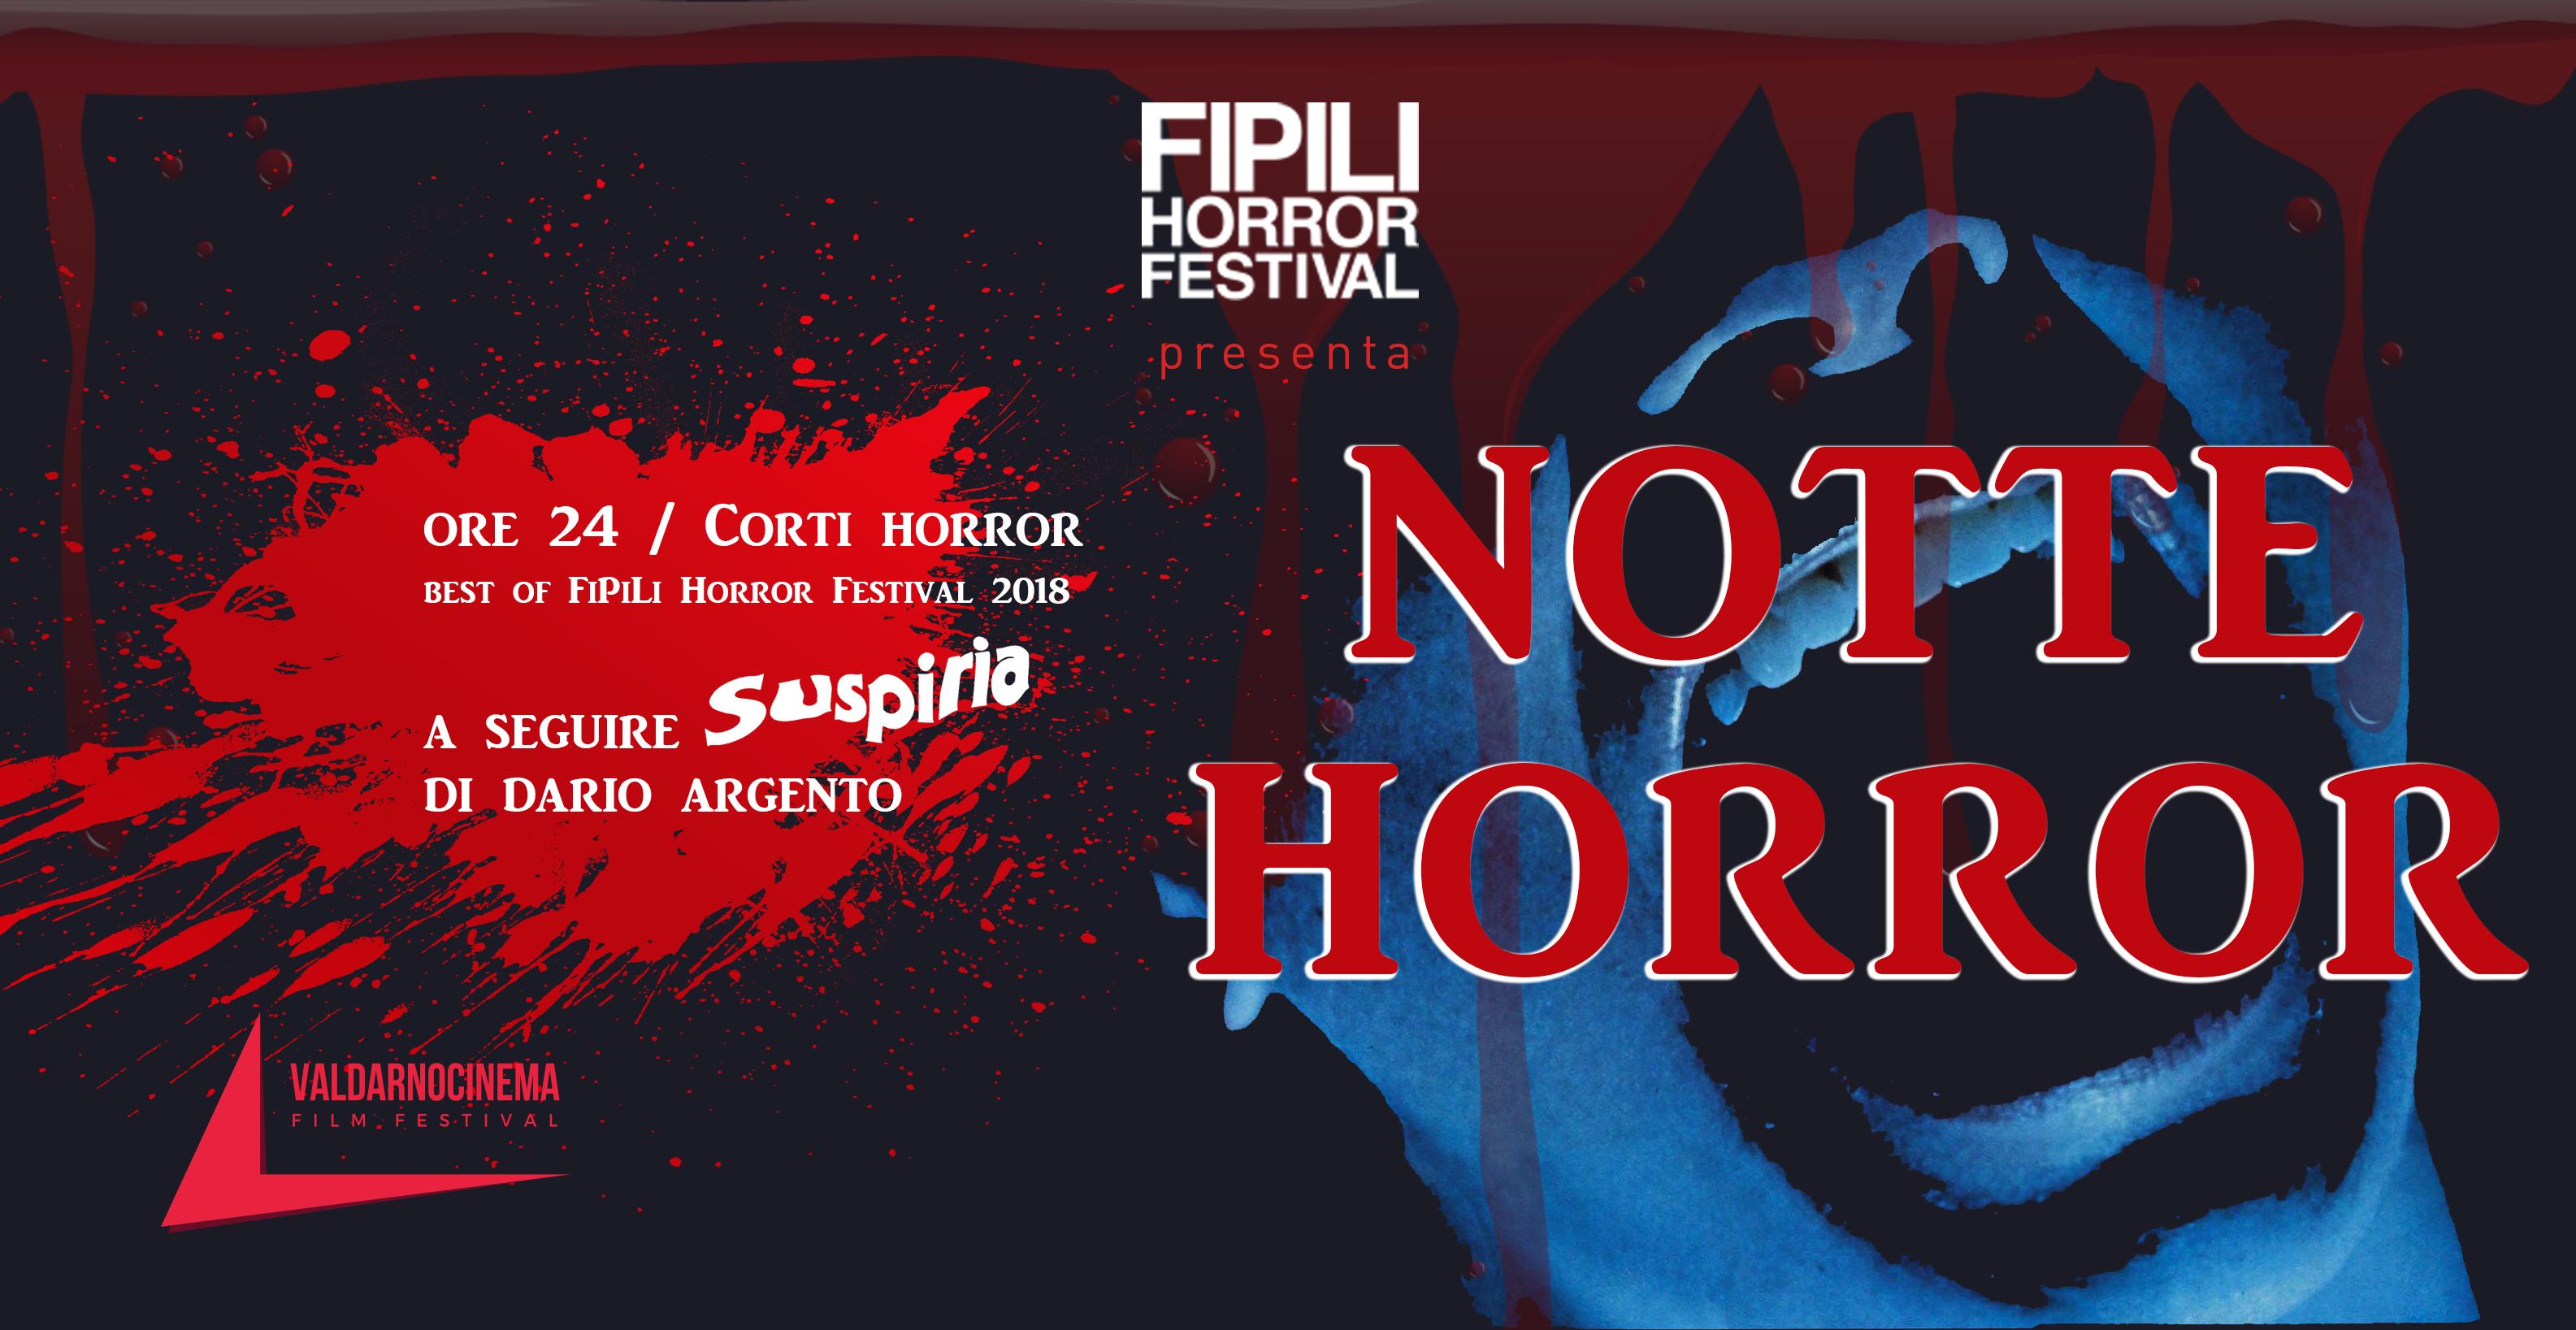 Notte Horror a cura di FiPiLi Horror Festival